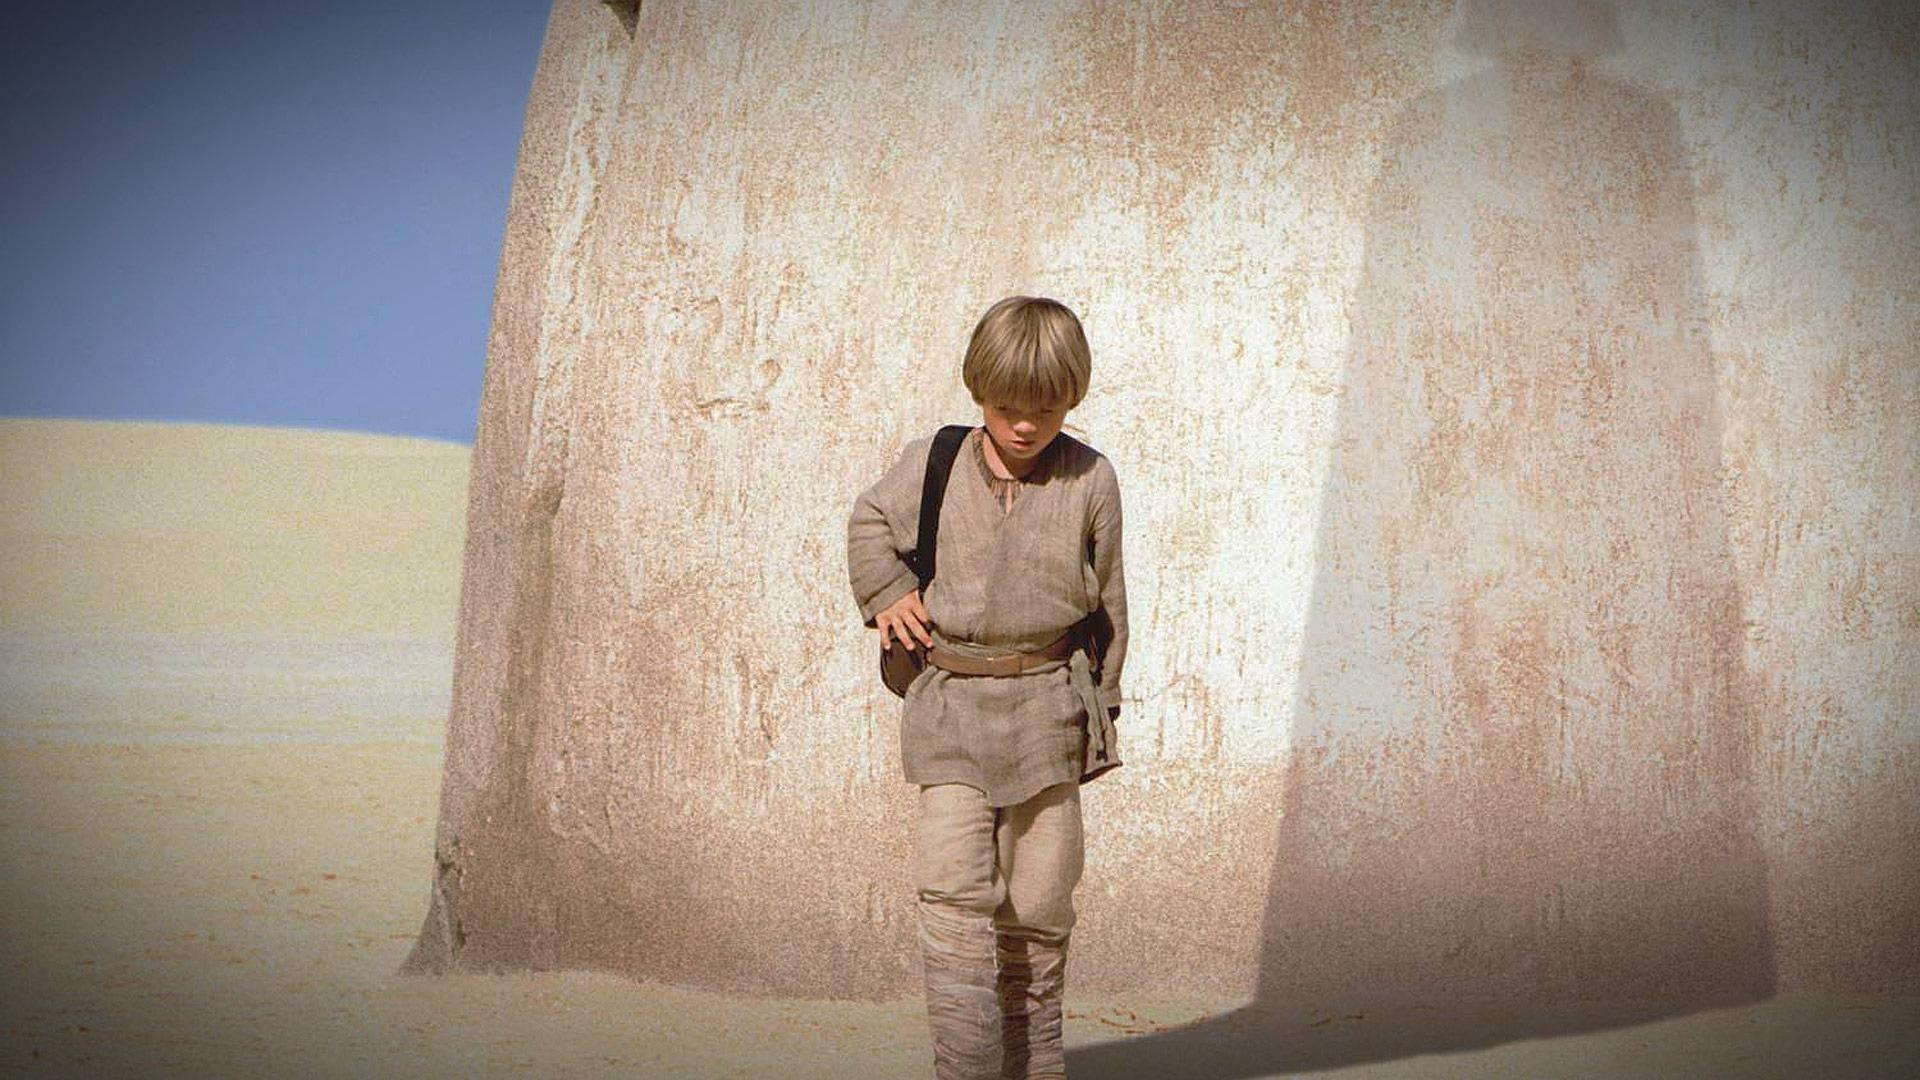 Anakin Skywalker Shadow 1920x1080 Download Hd Wallpaper Wallpapertip